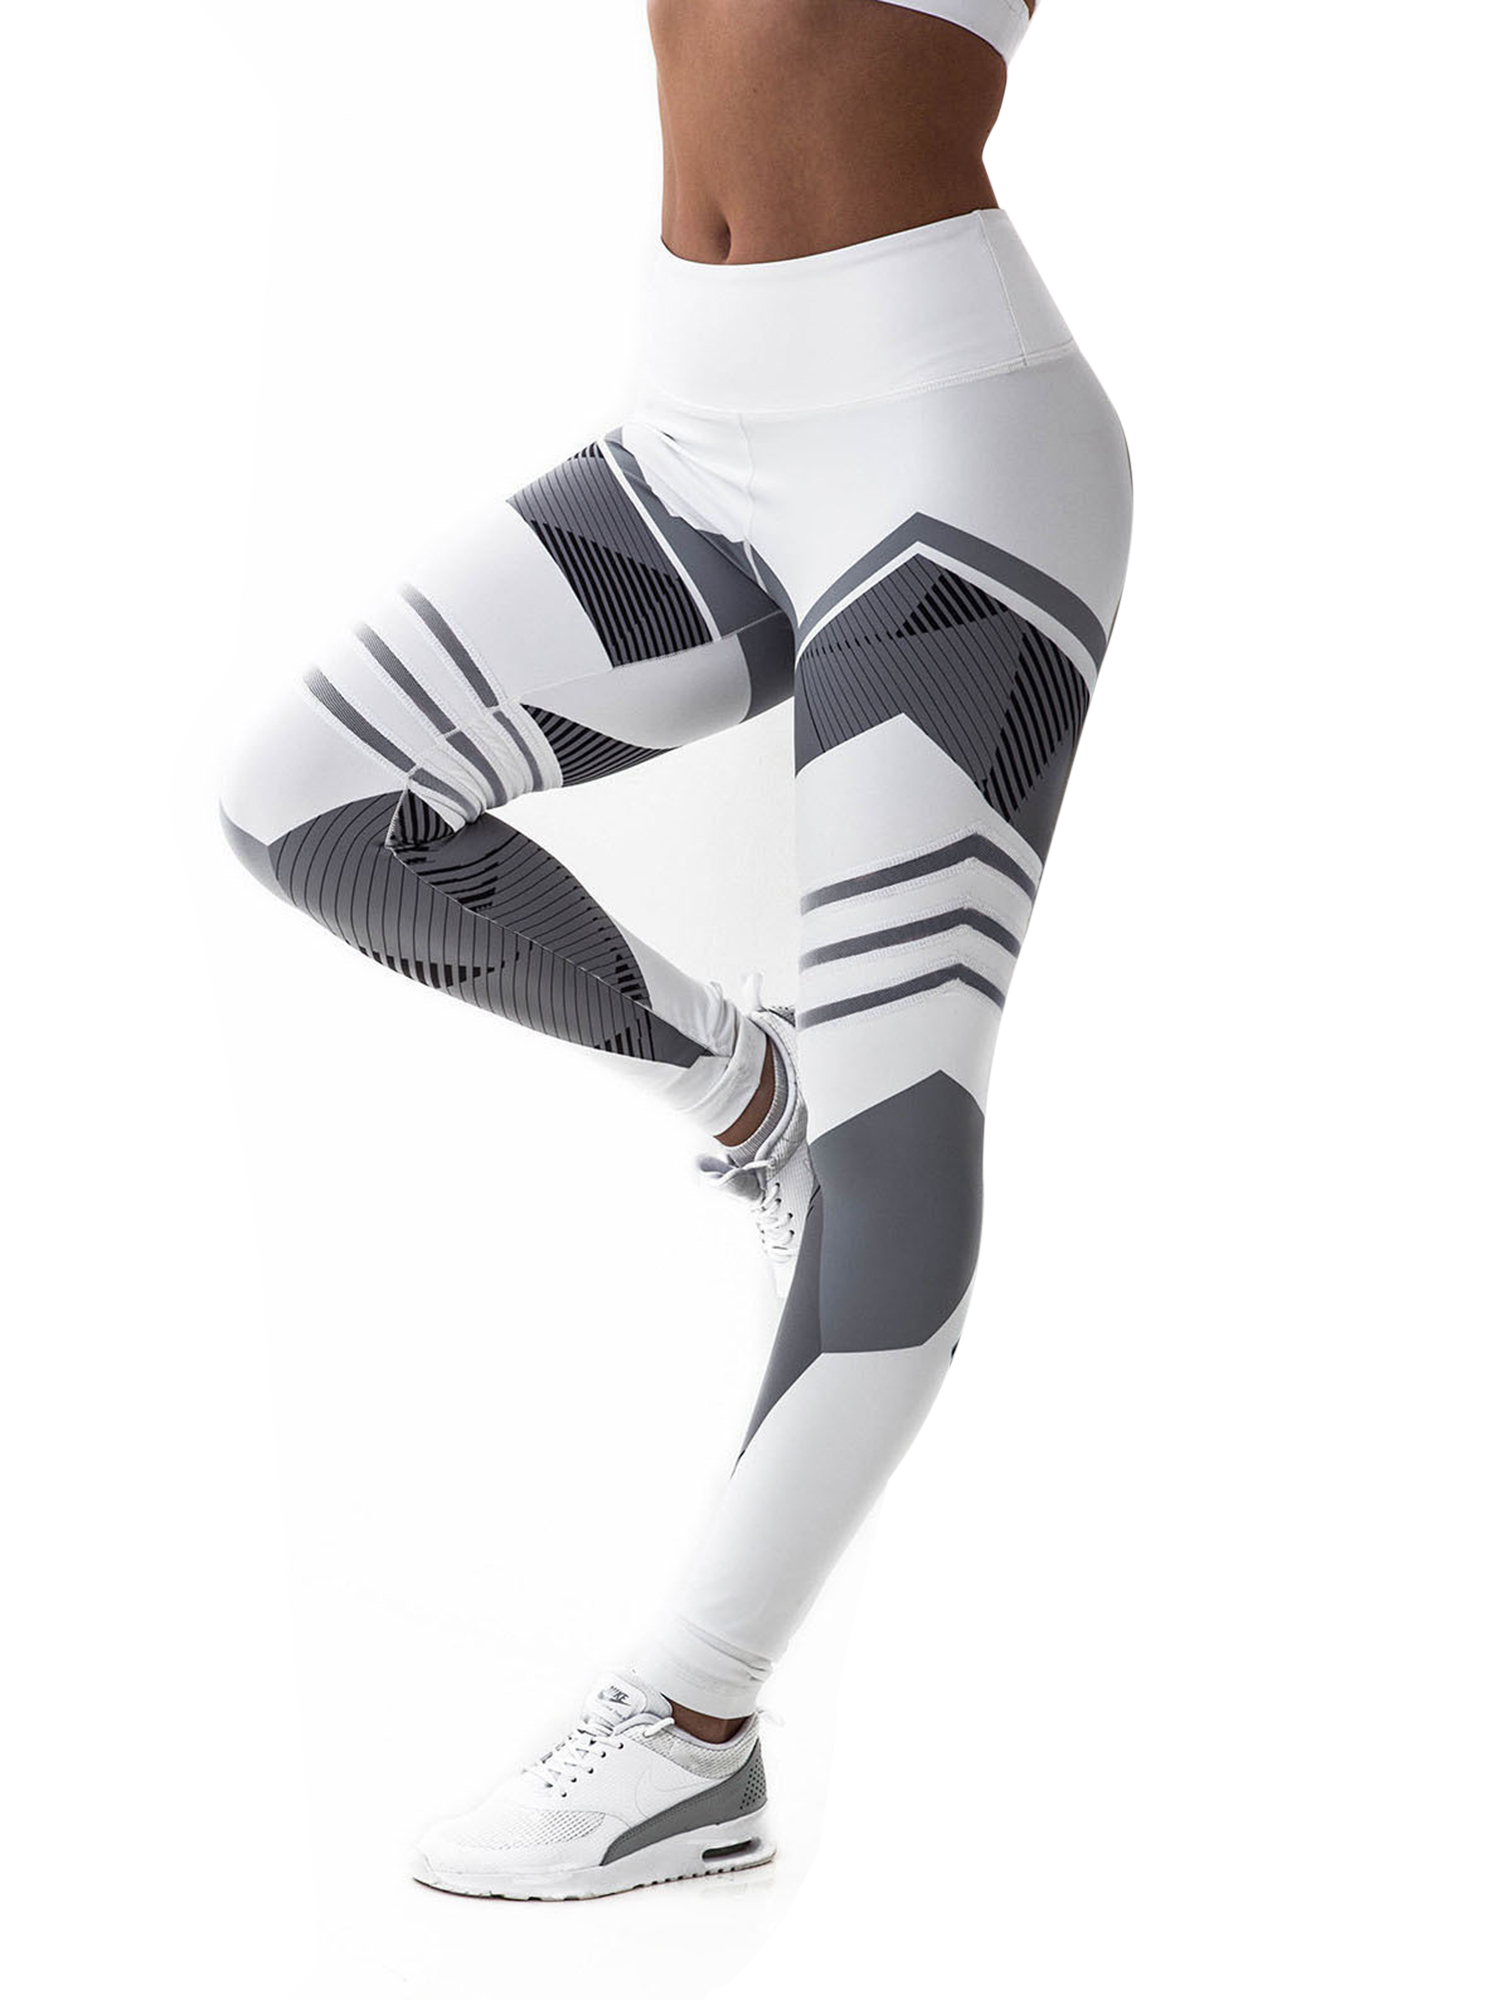 High Waist Leggings XS-XL All-Over Print Blue Pattern Blue Star Yoga Leggings Gym Workout Fitness